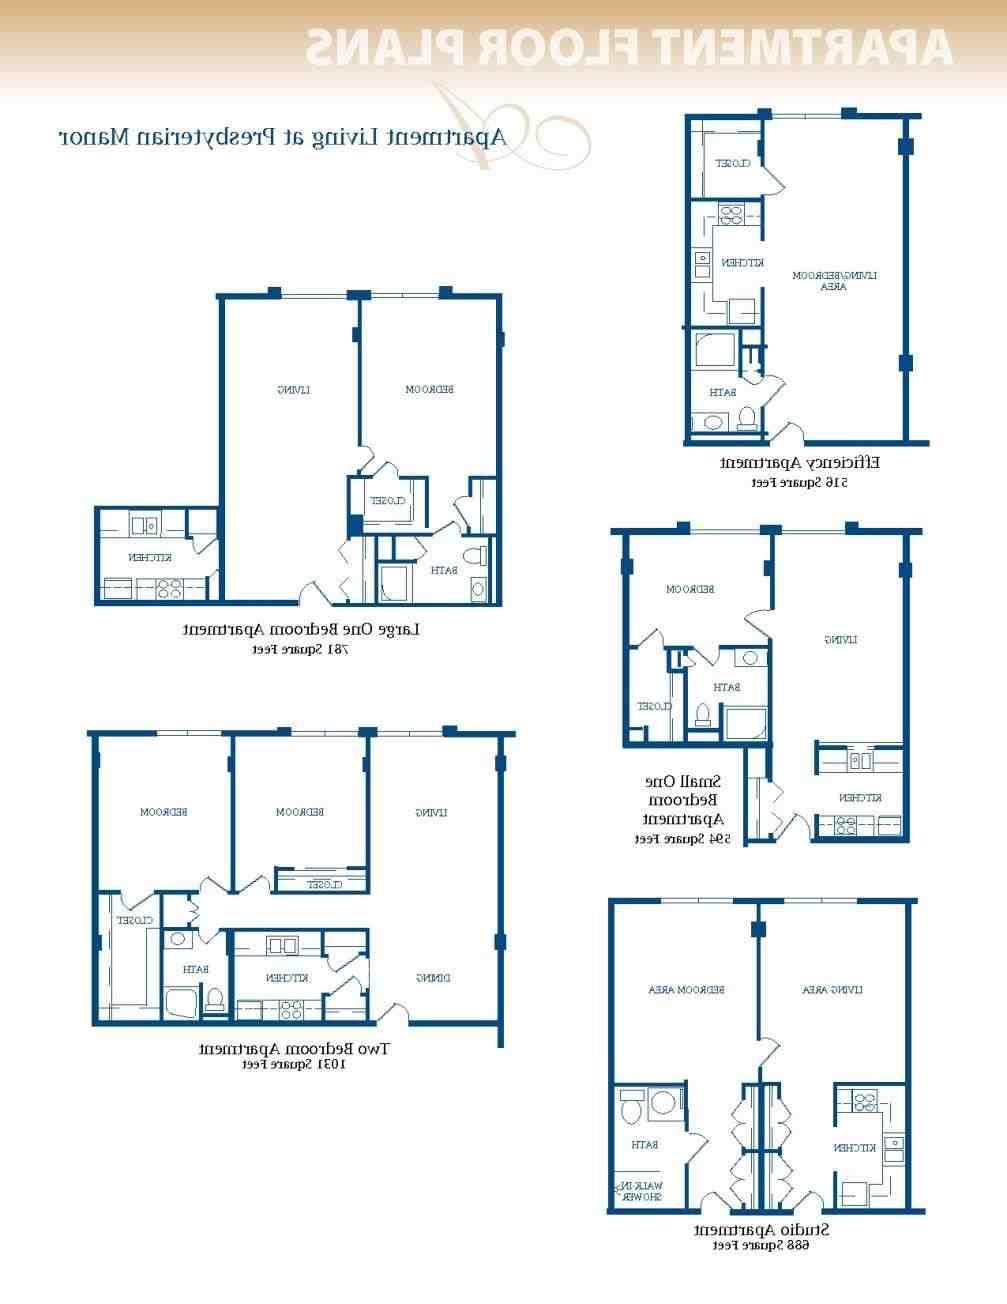 Luxury One Bedroom Apartment Floor Plans Bedroom Studio 1 2 Apartments In Atlanta Highla Studio Apartment Layout Small Apartment Plans Small Apartment Layout